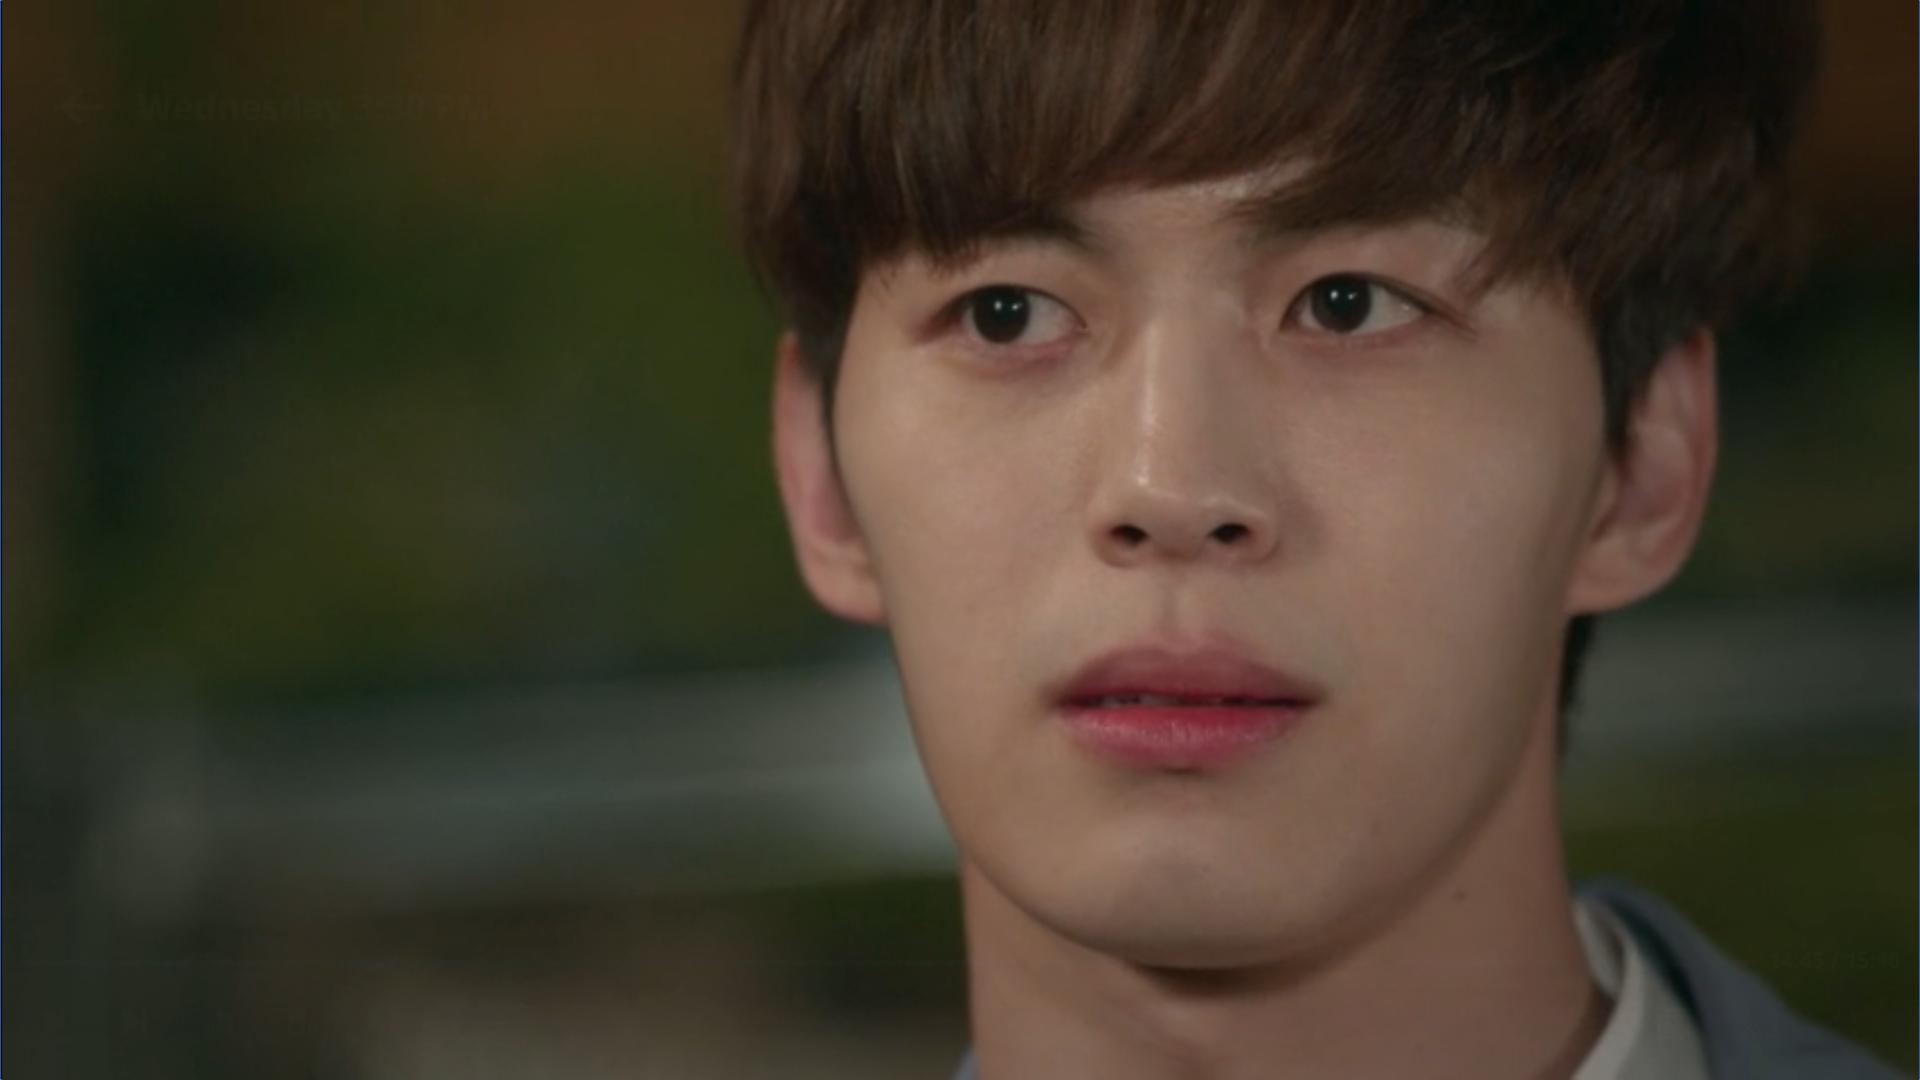 Wednesday 3:30 PM Yoon Jae-won